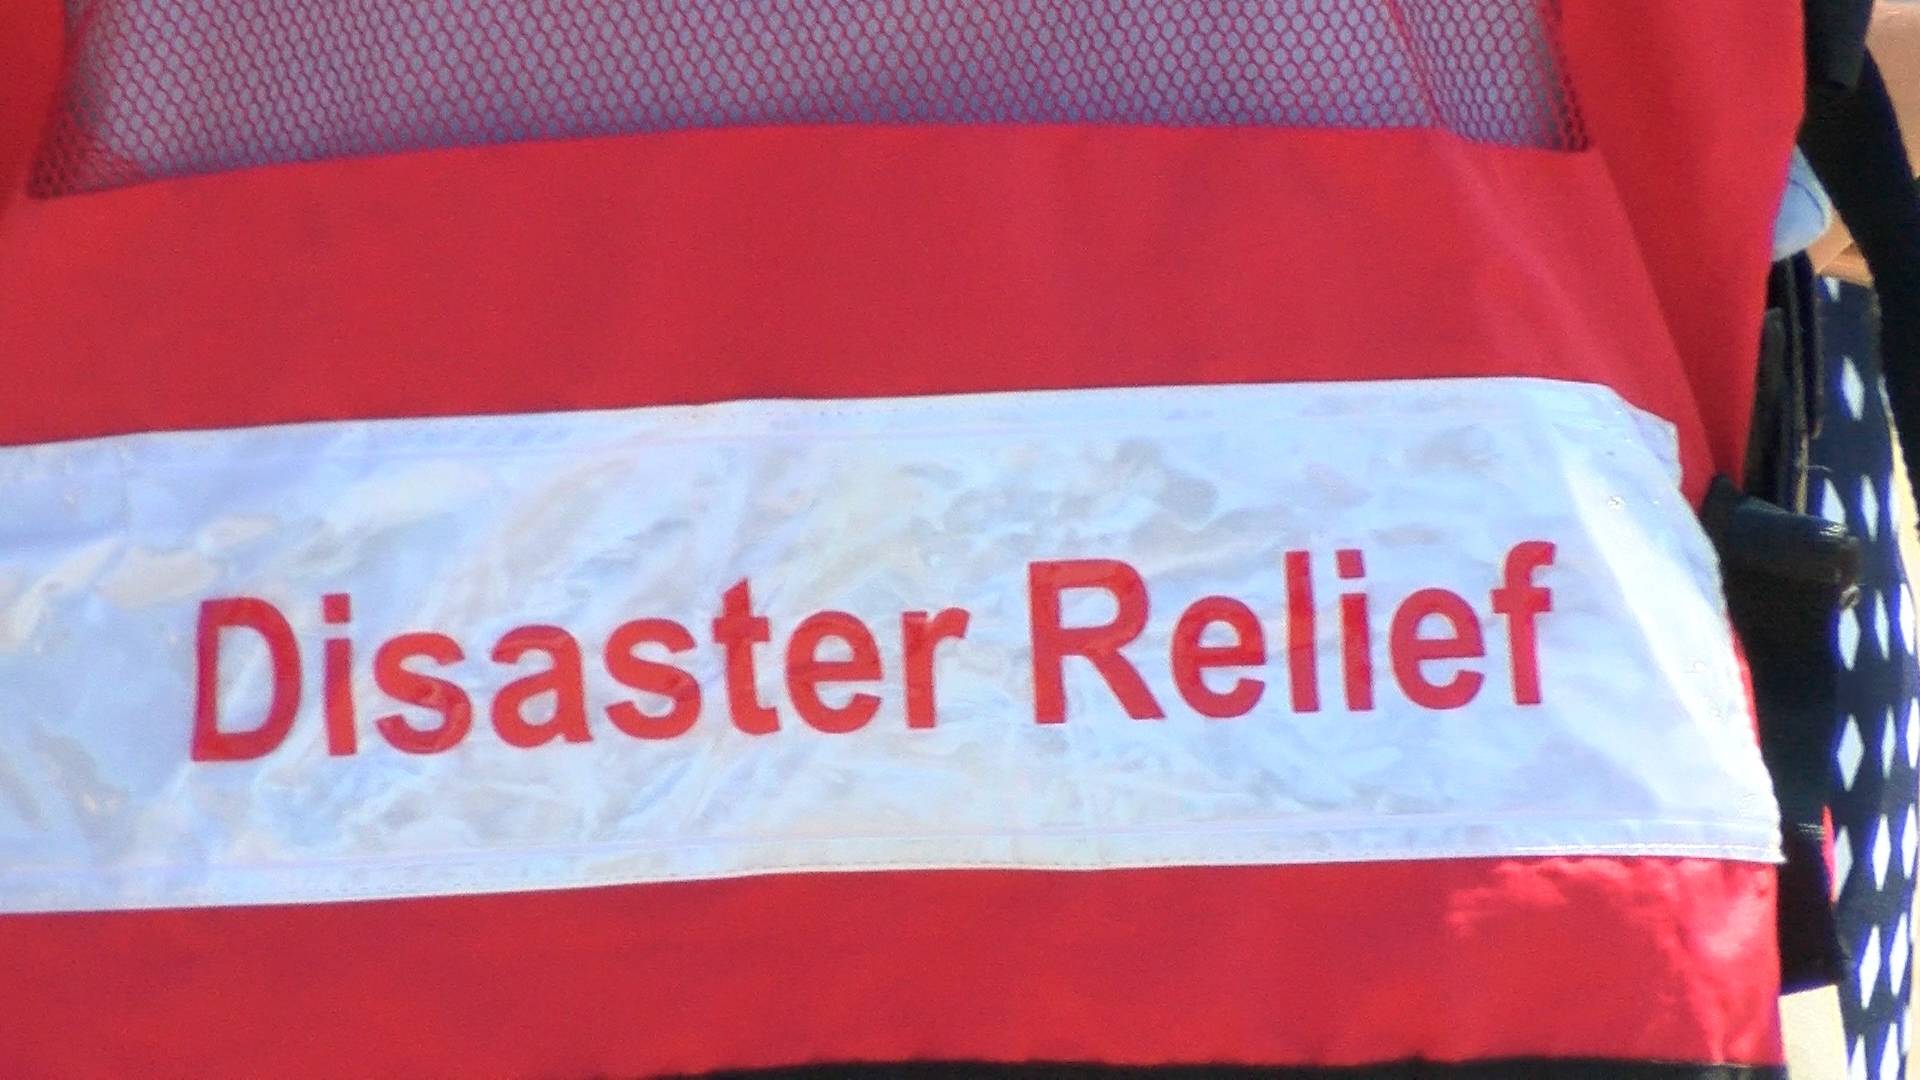 DISASTER RELIEF_1505777618354.jpg